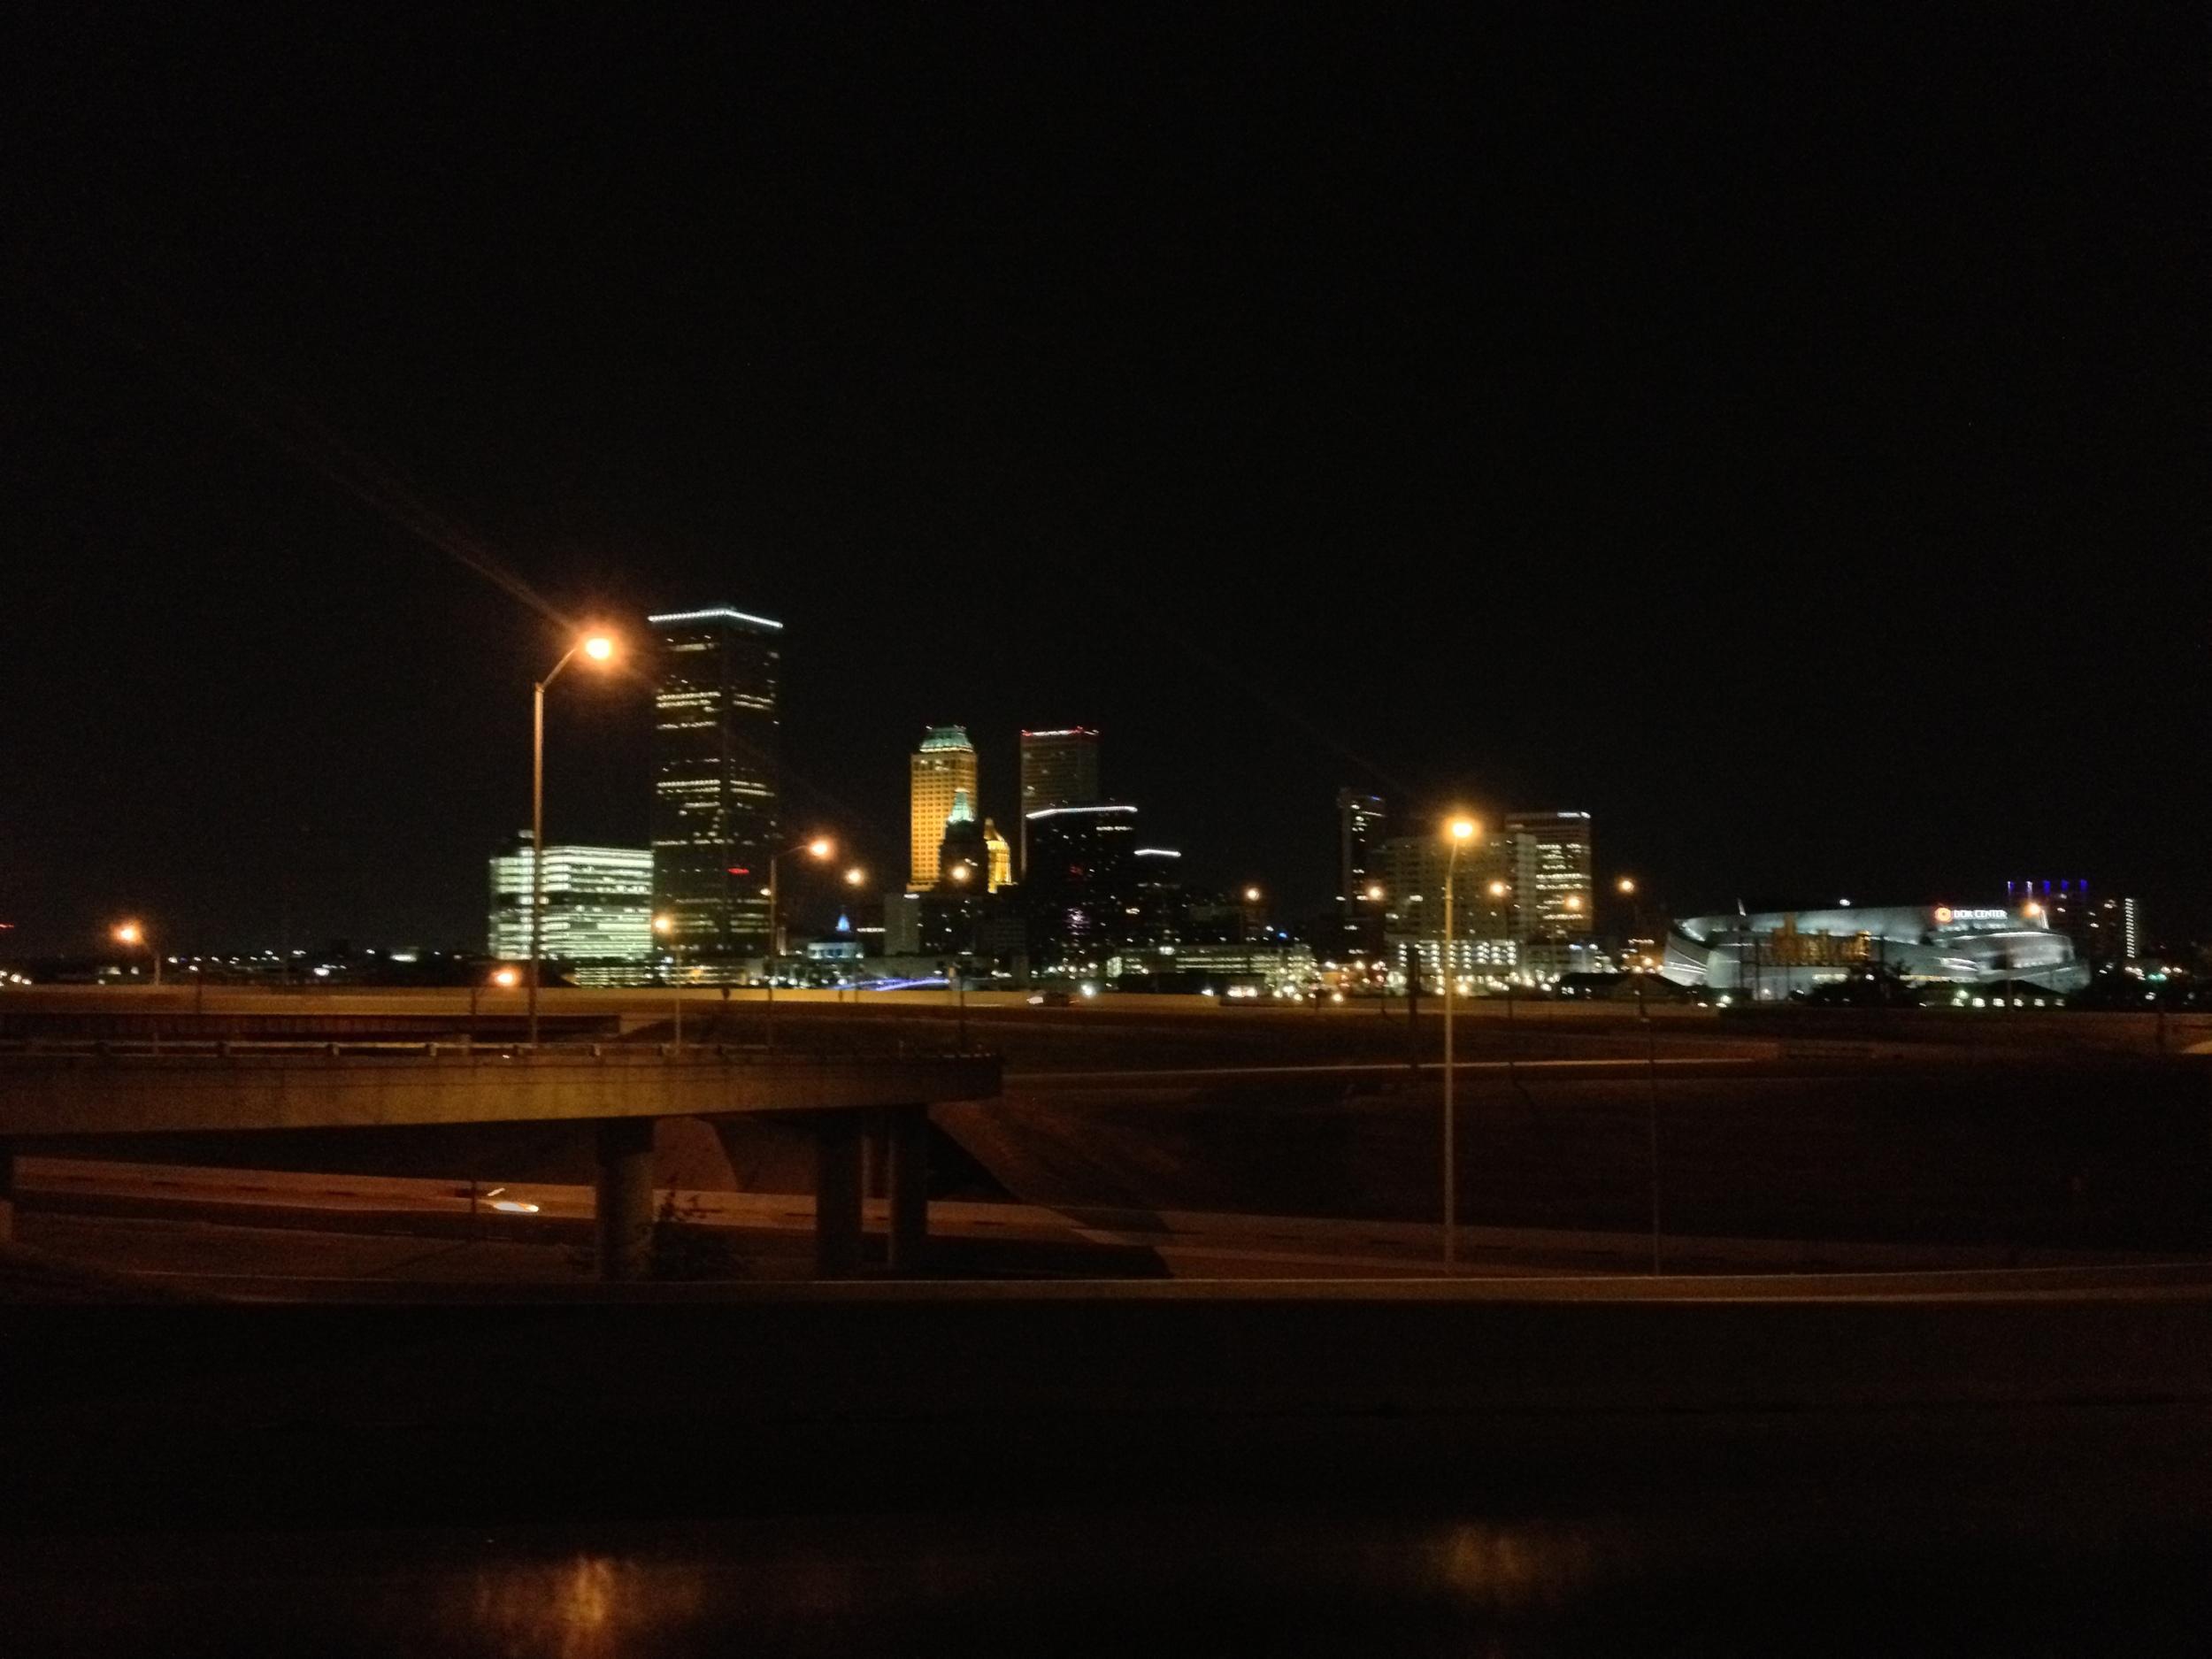 Tulsa, Oklahoma at Night